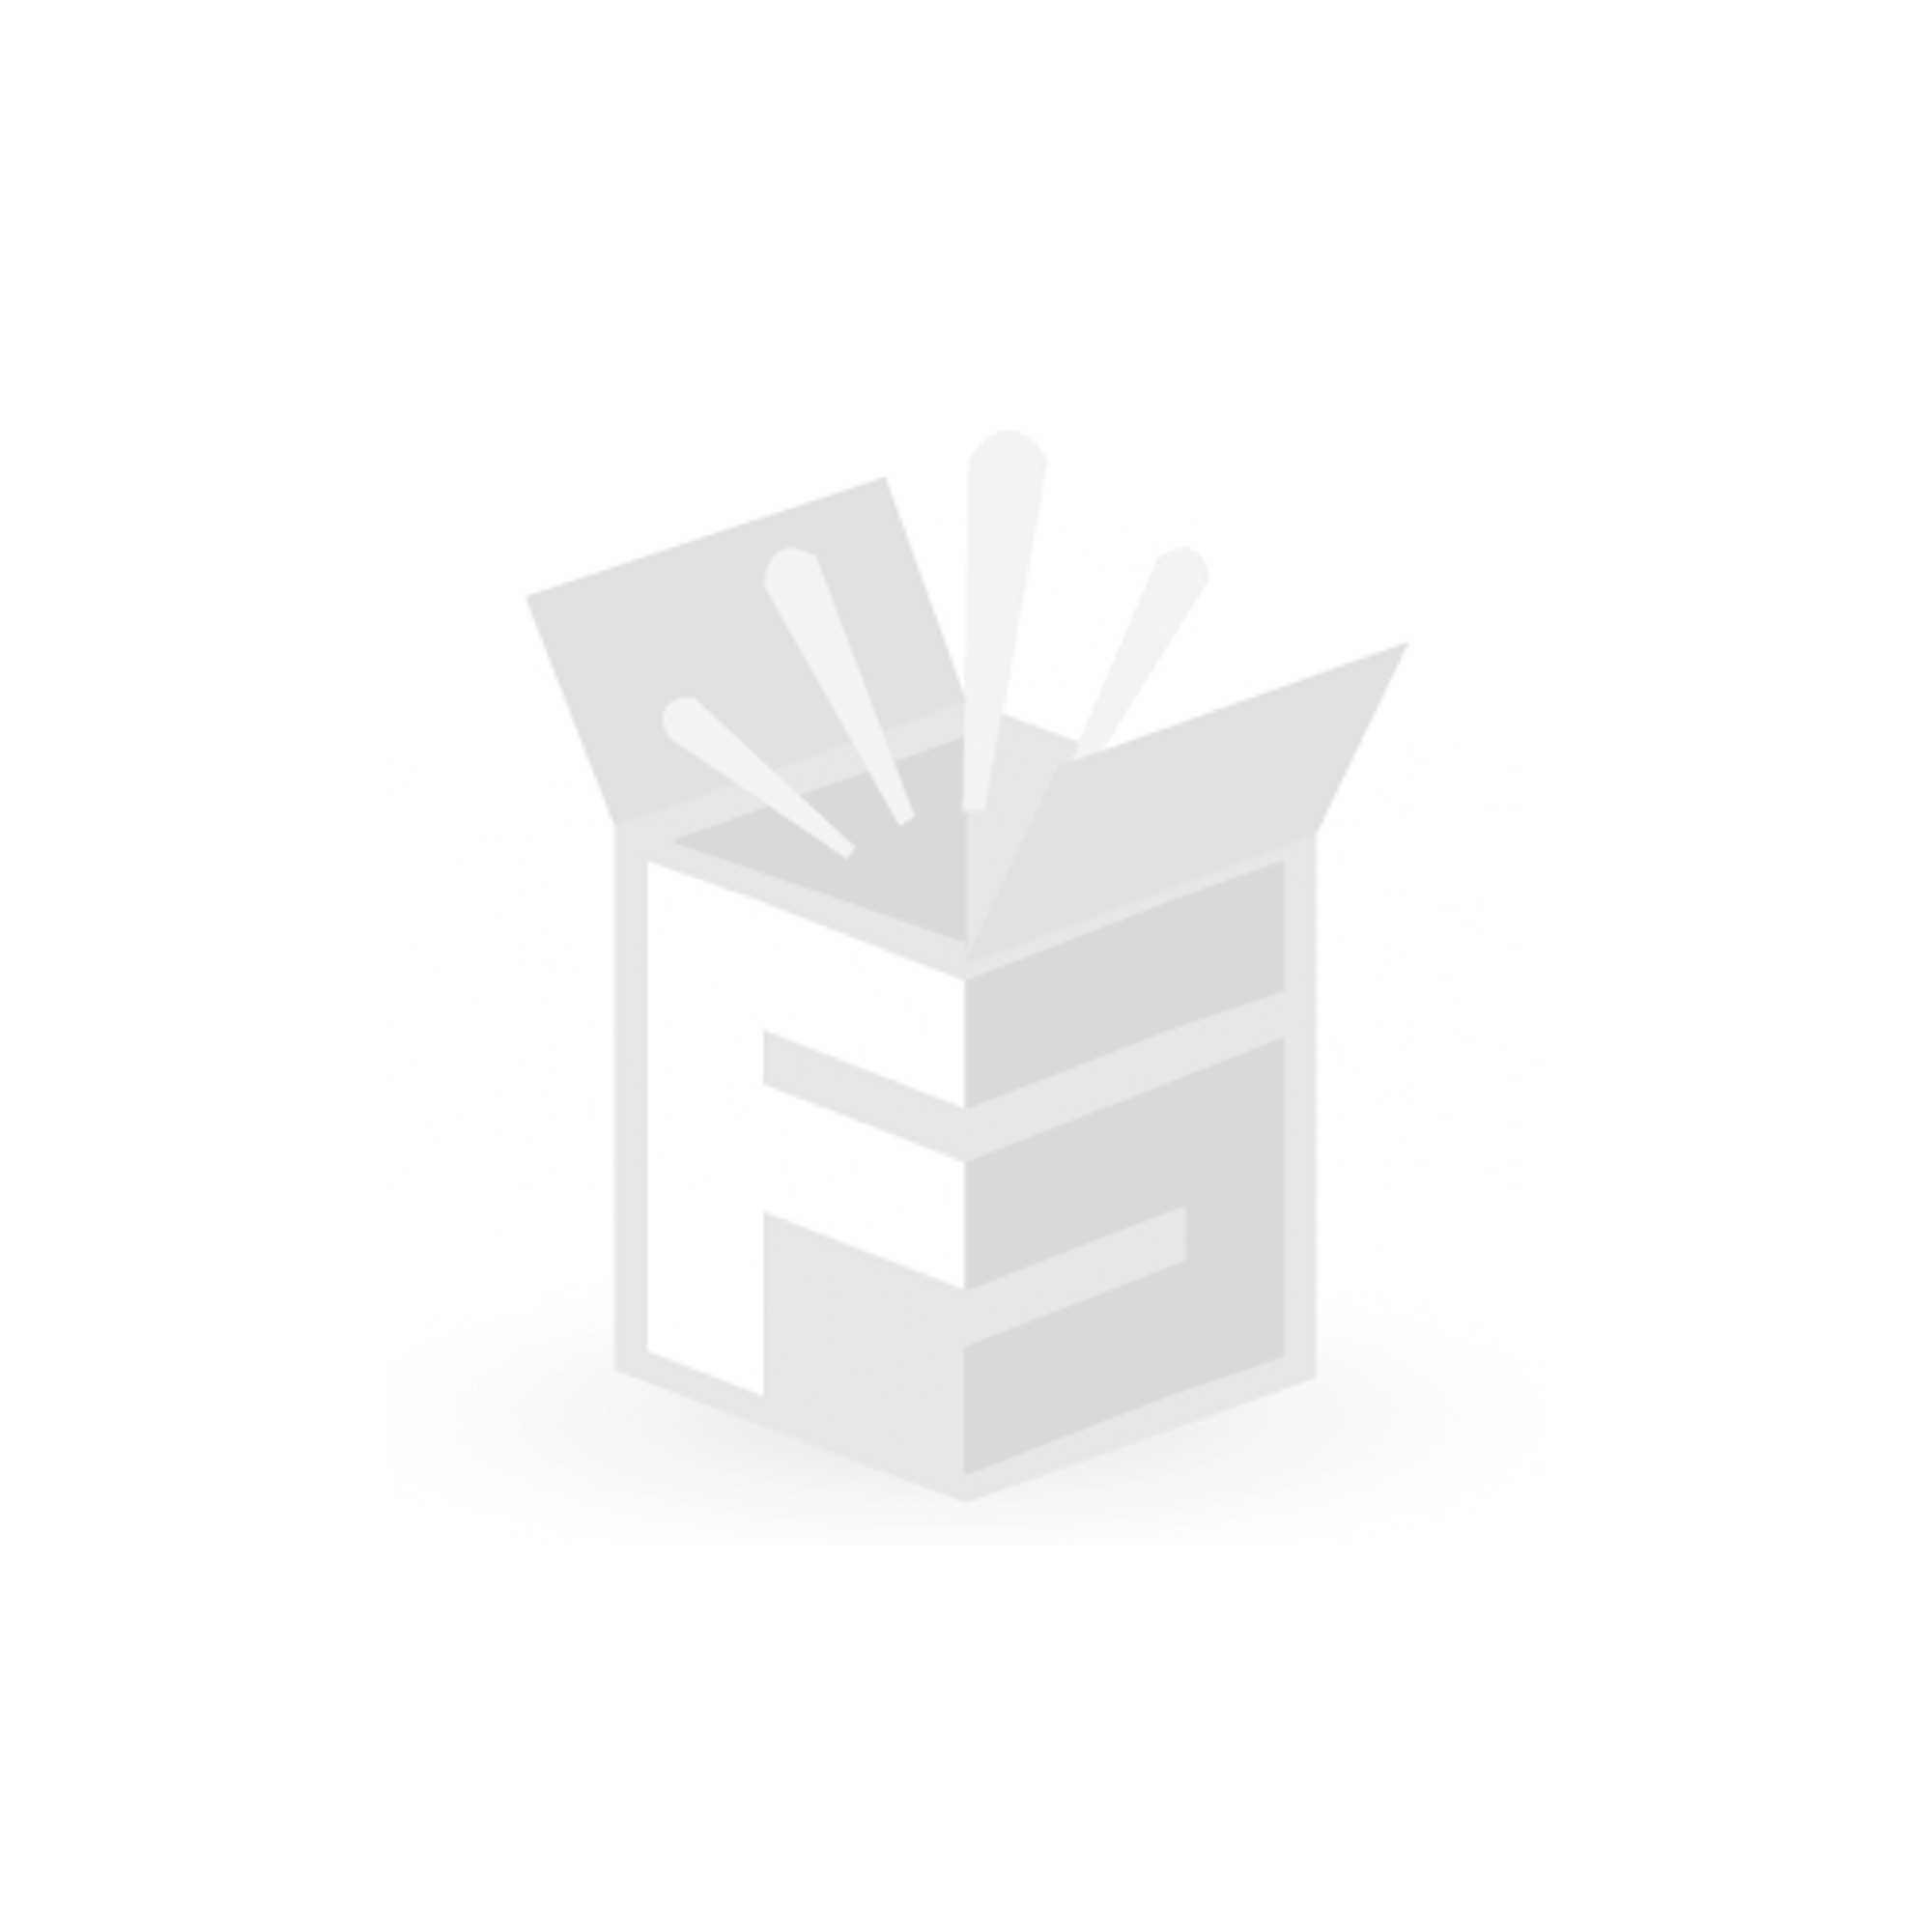 bosch handstaubsauger bbhl21435 kabellos staubsauger. Black Bedroom Furniture Sets. Home Design Ideas